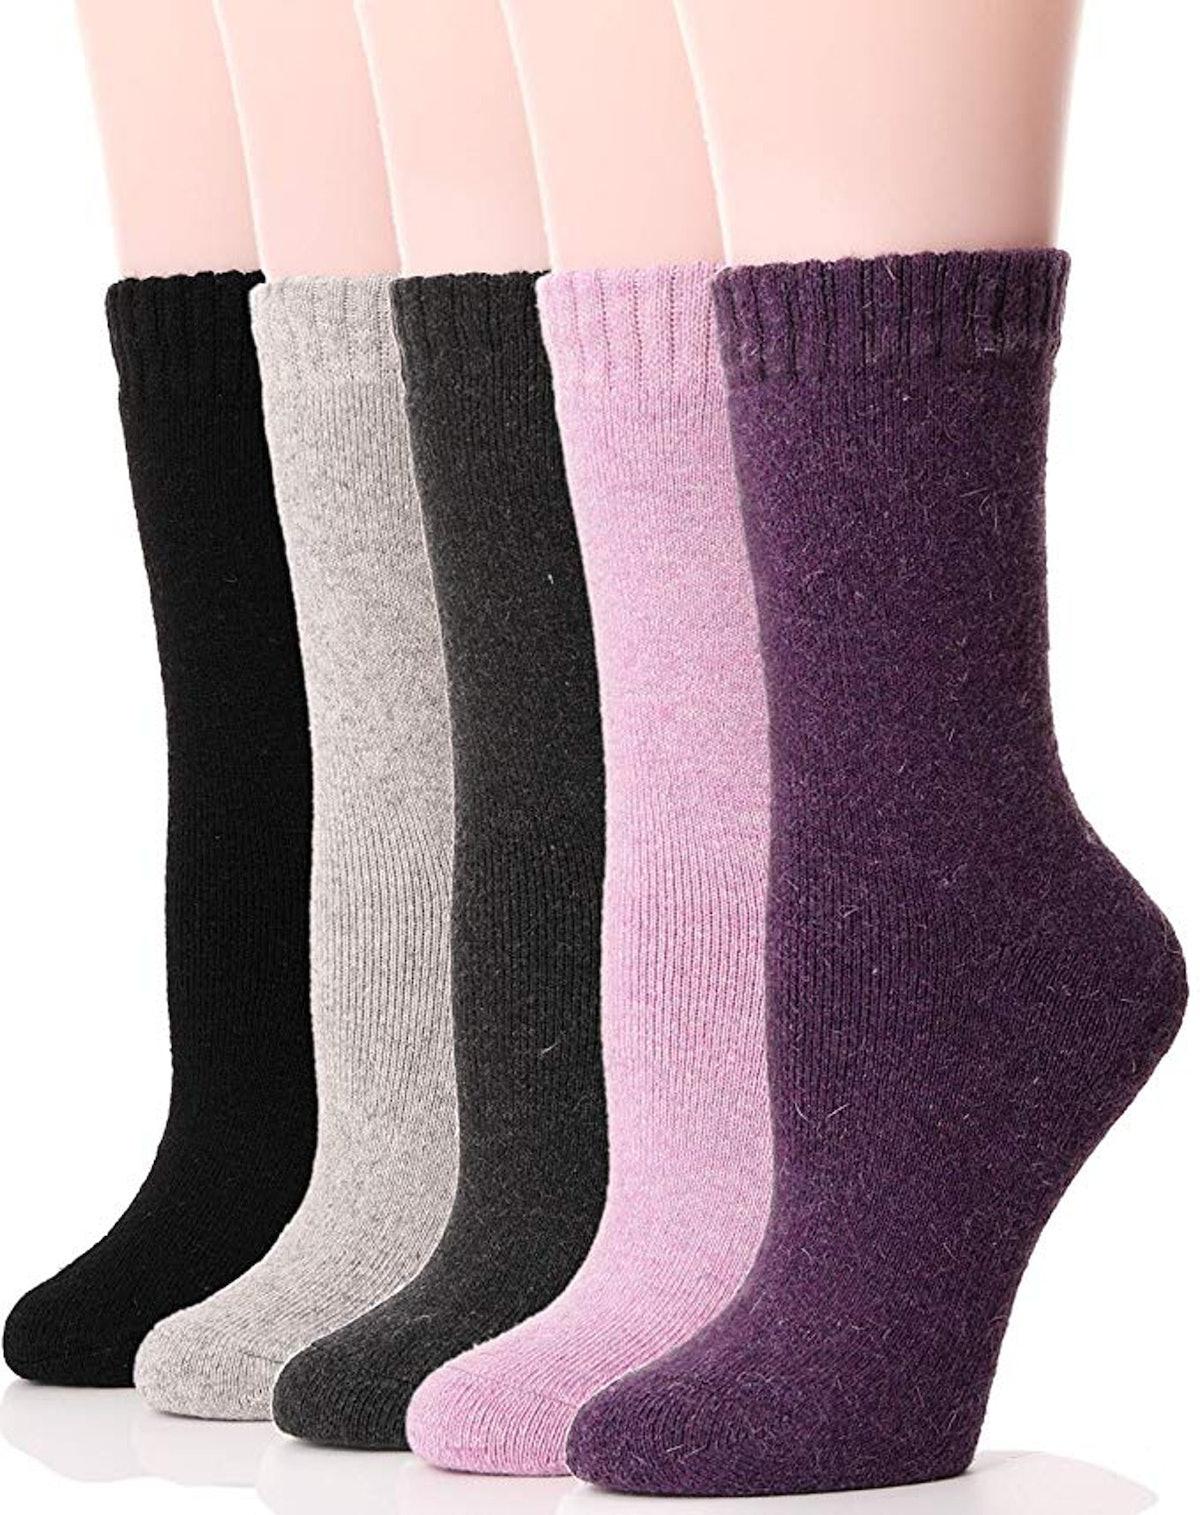 Ebmore Womens Wool Socks (5 Pack)